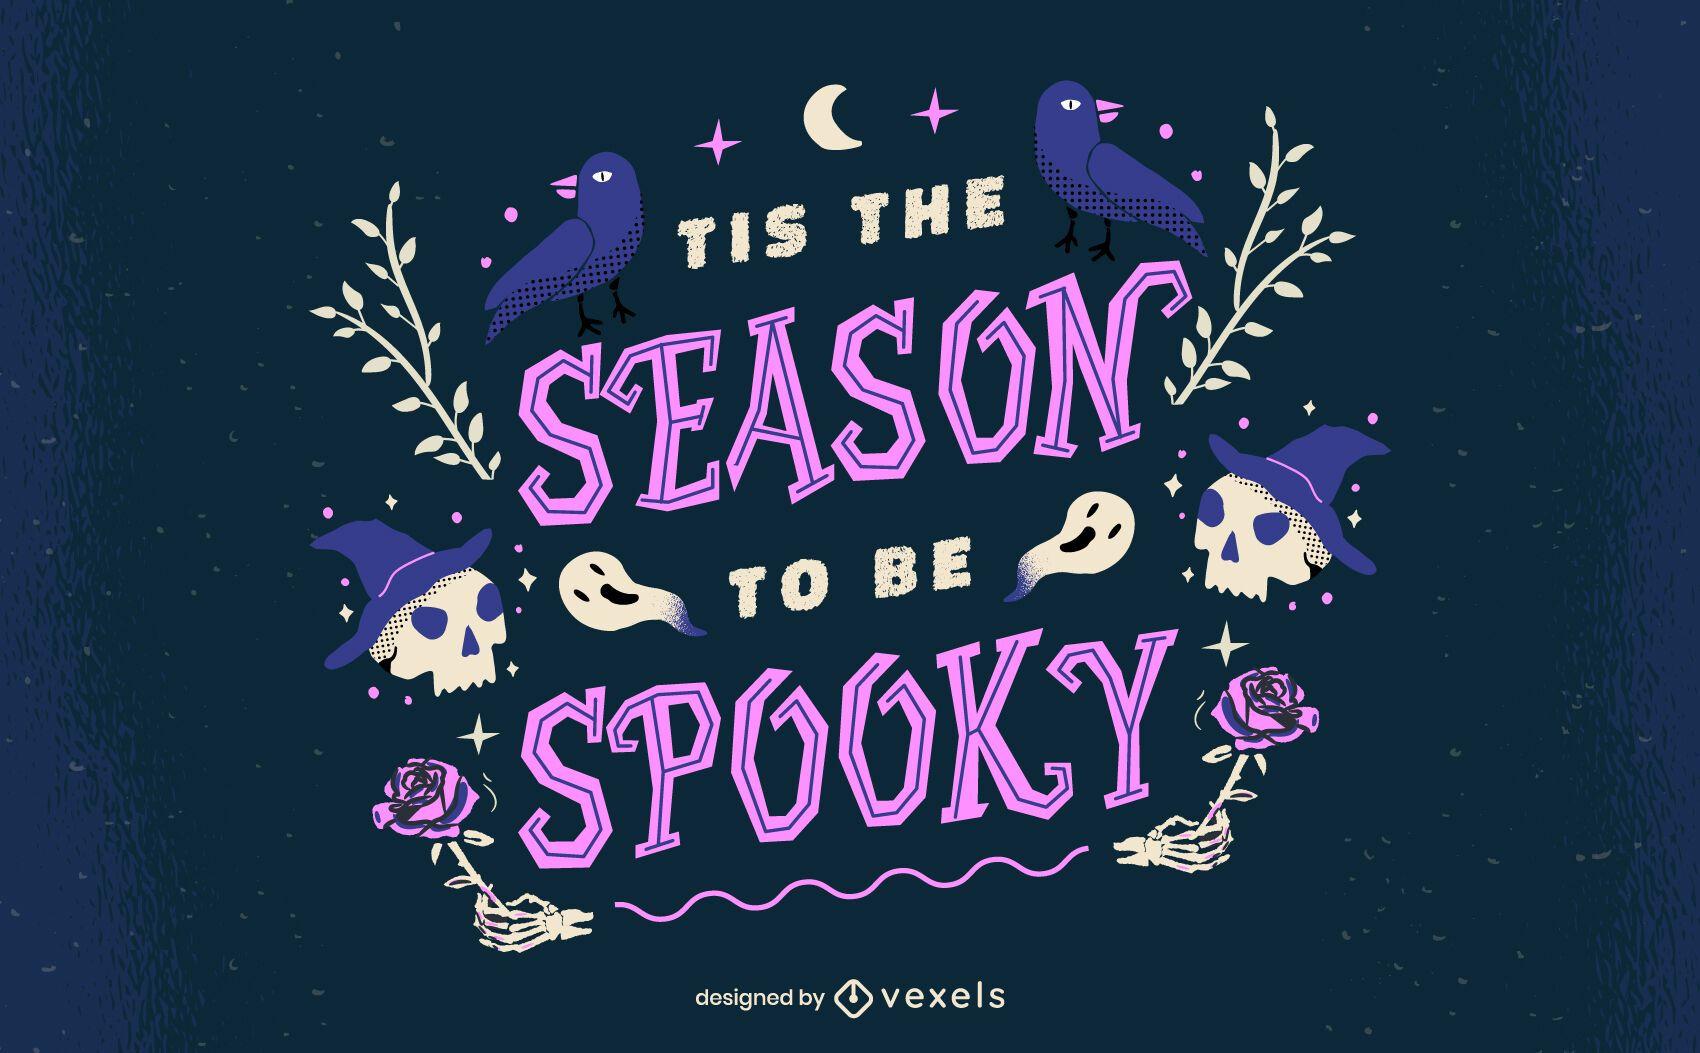 Season to be spooky halloween lettering